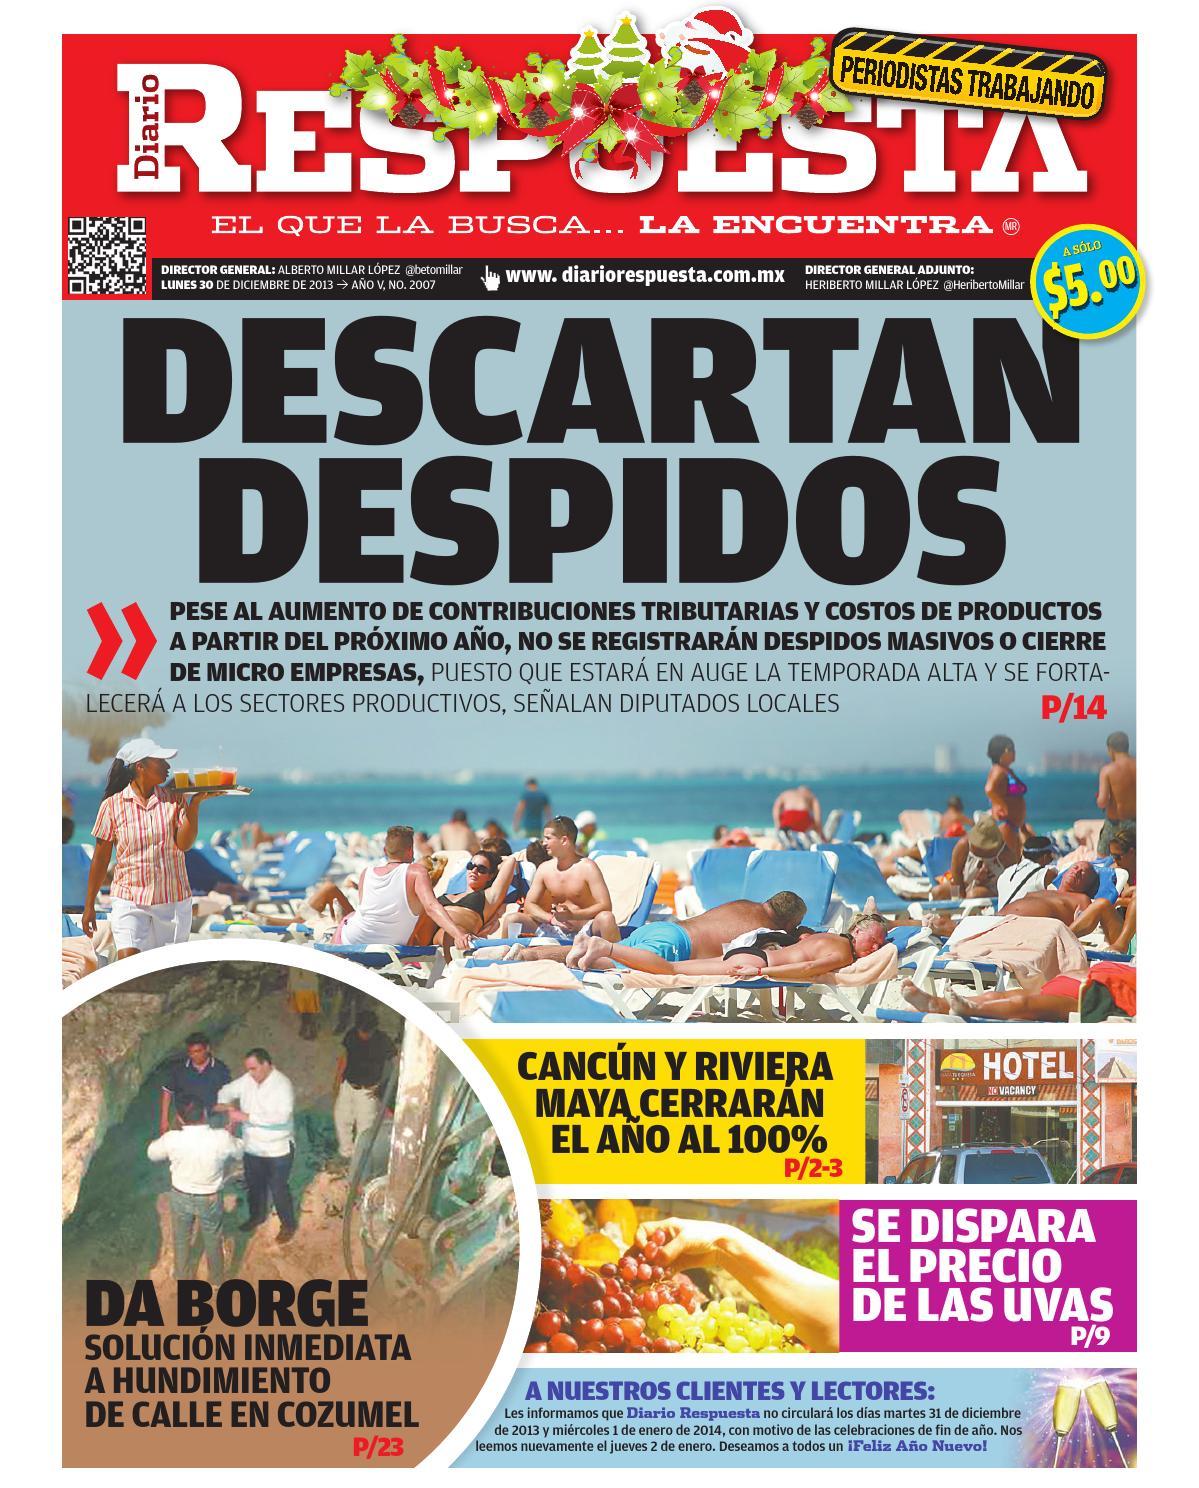 Respuesta by Diario Respuesta - issuu 35aed3ee164b4